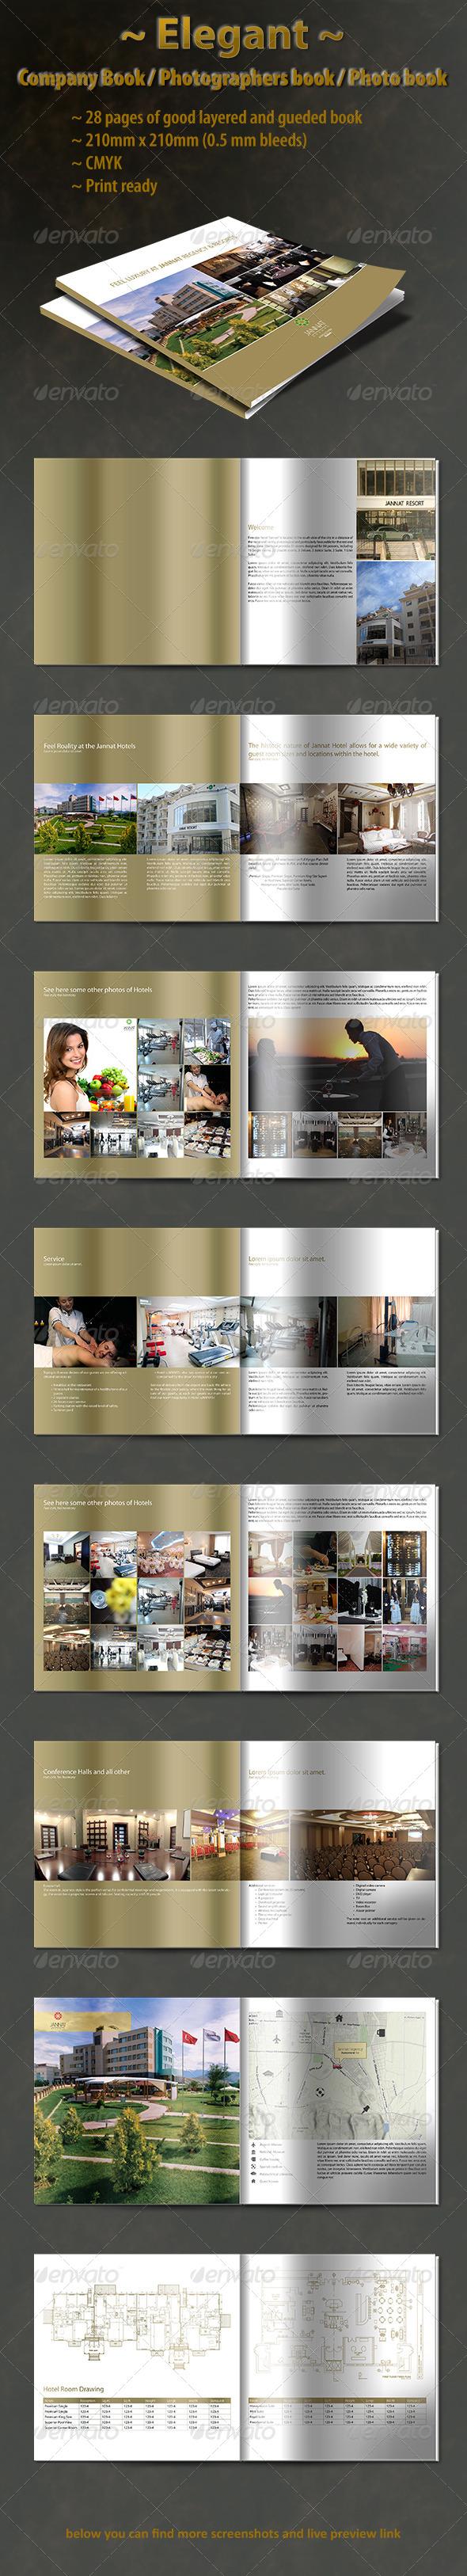 Elegant Company Book Template - Magazines Print Templates